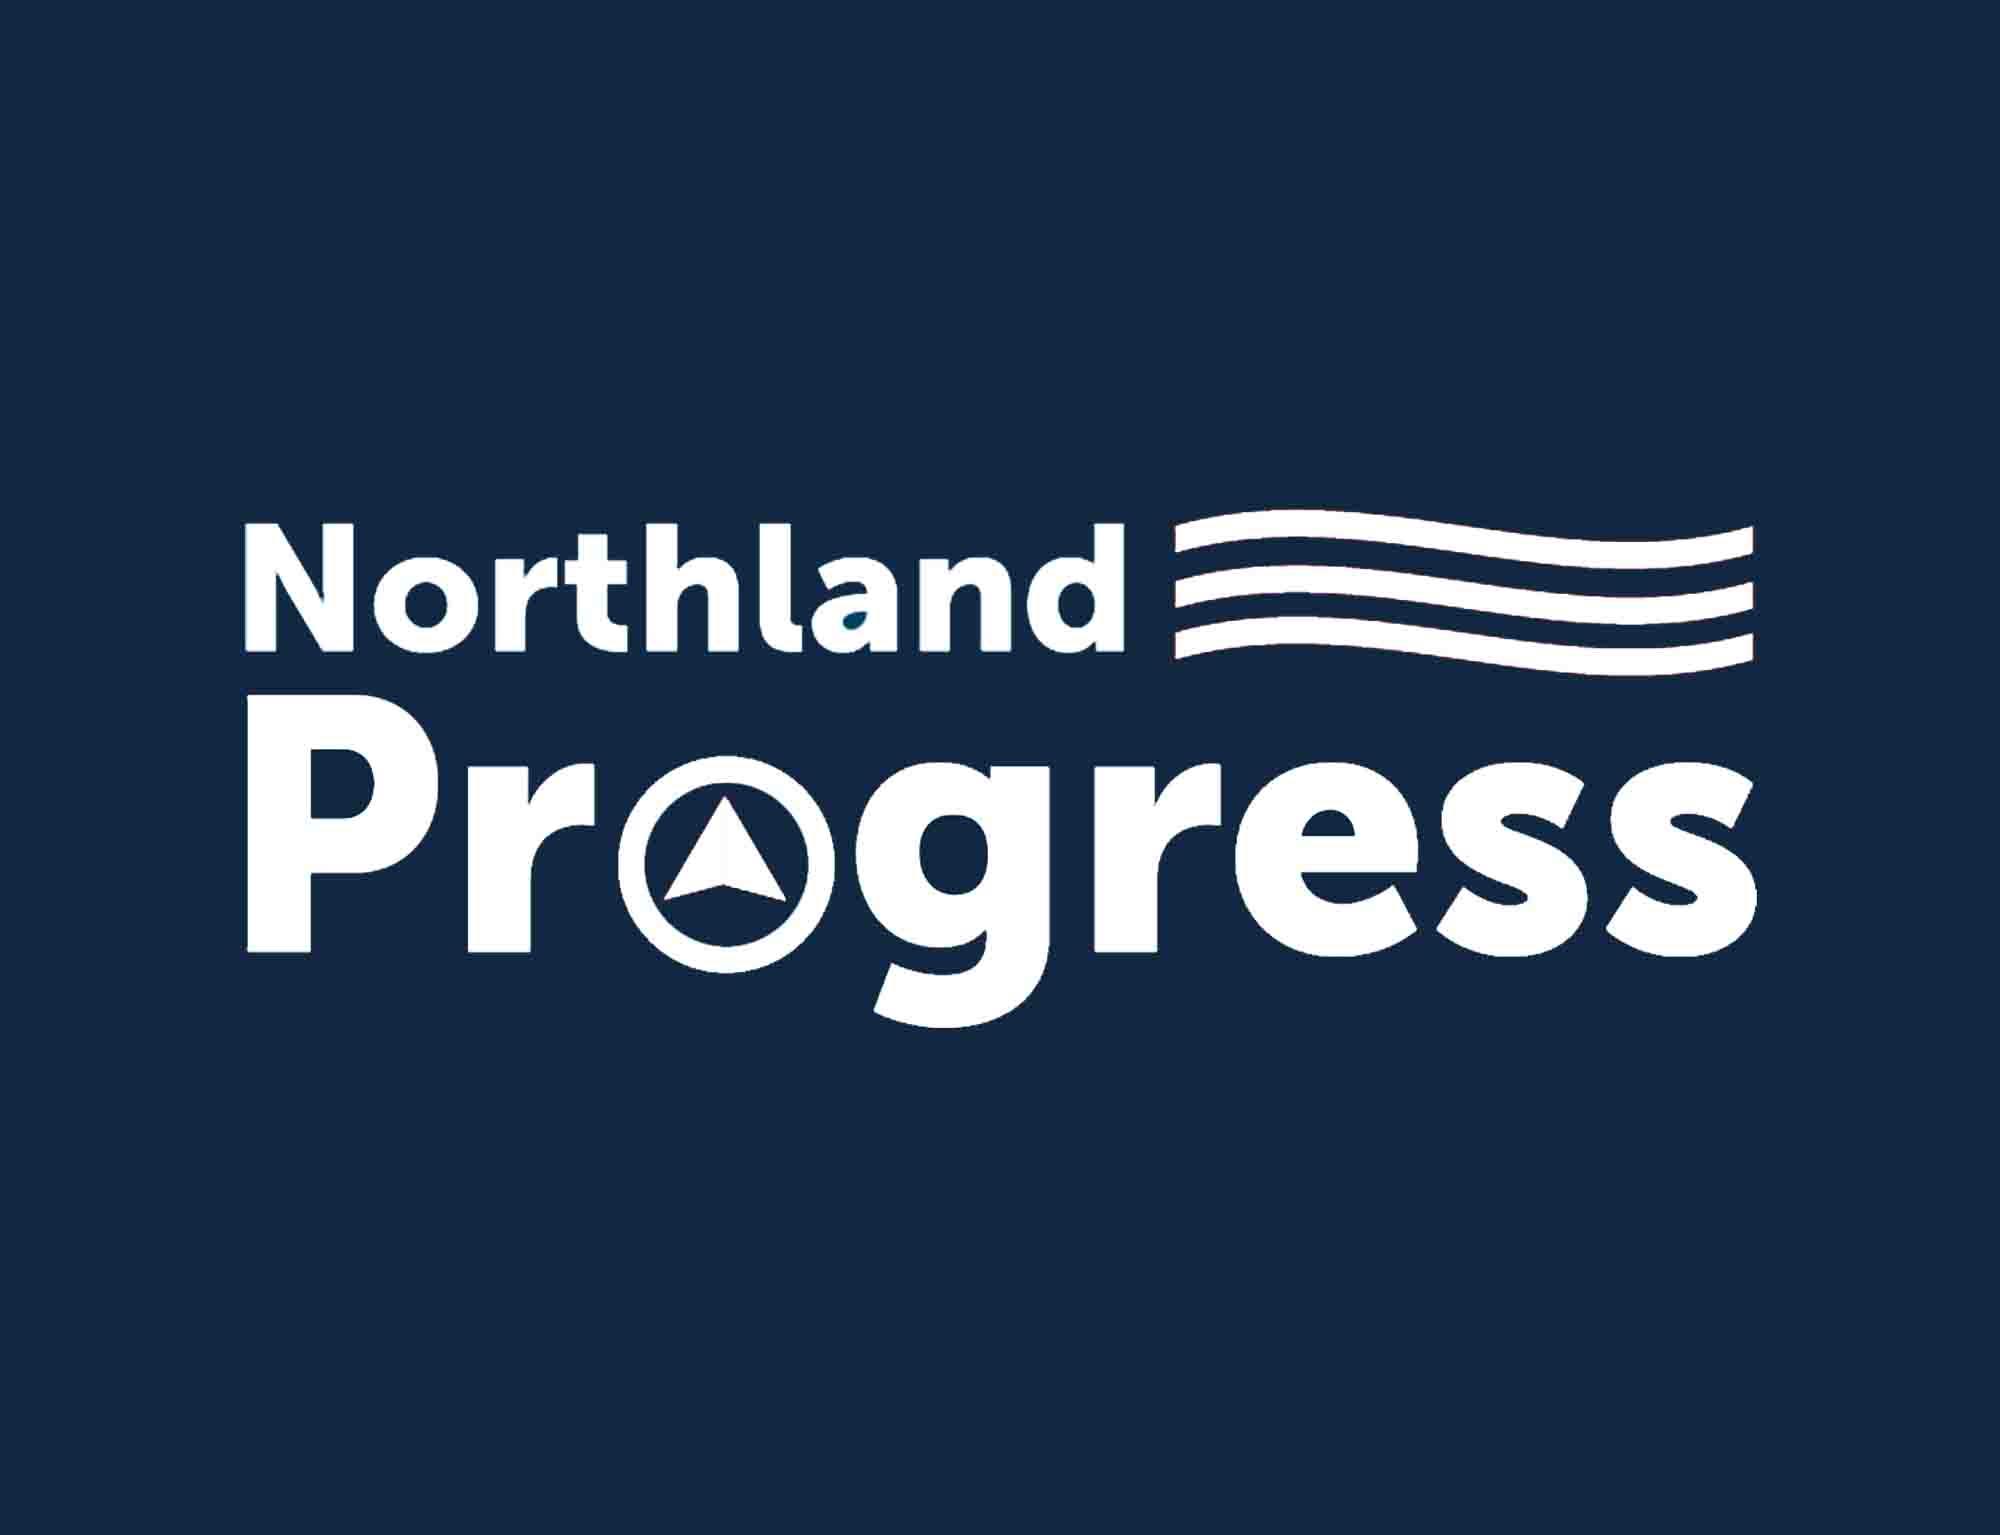 Northland Progress